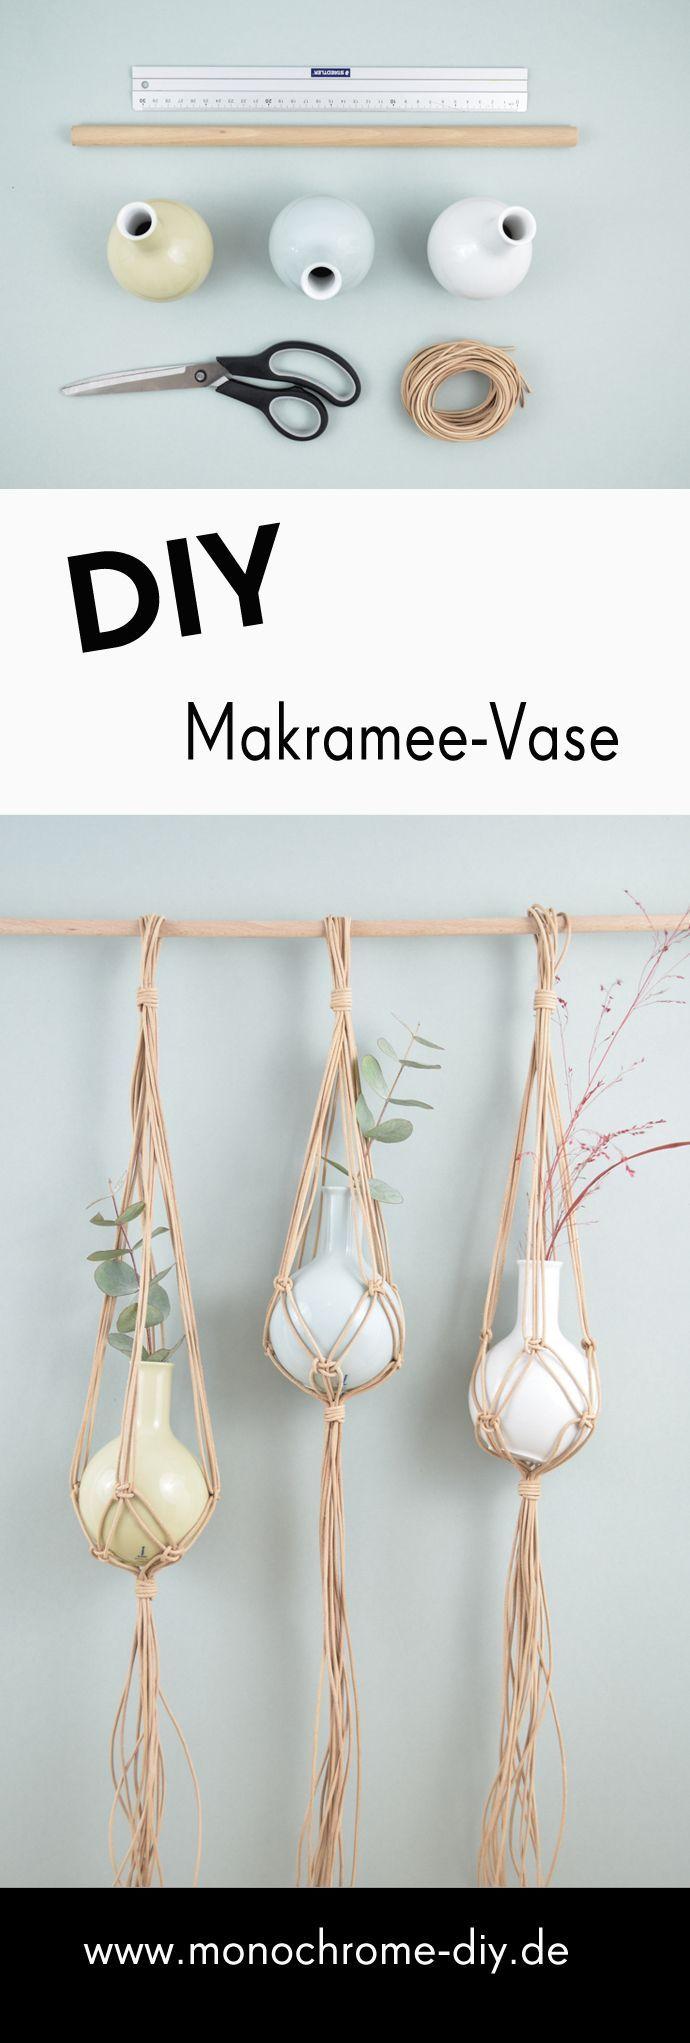 Mix & Match: Makrameevase mit KMP Berlin